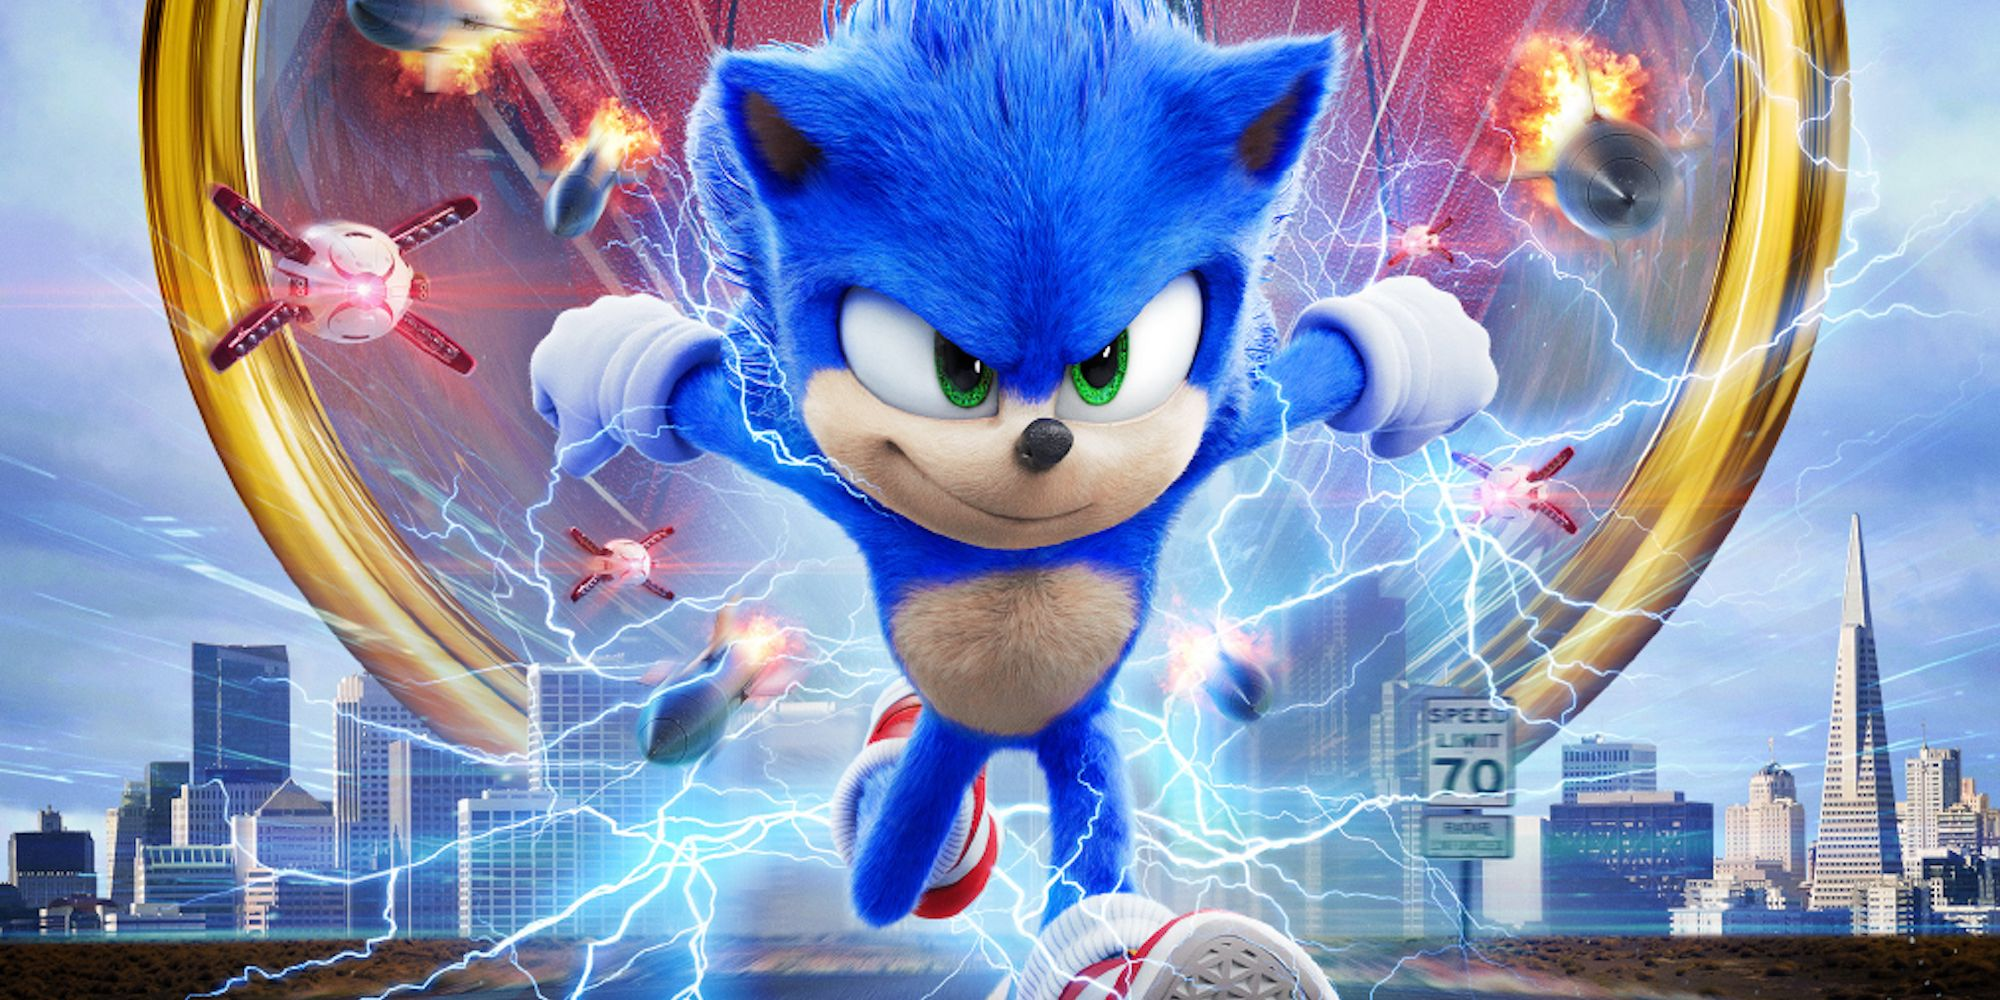 China Delays Sonic the Hedgehog Movie Release Due To Coronavirus